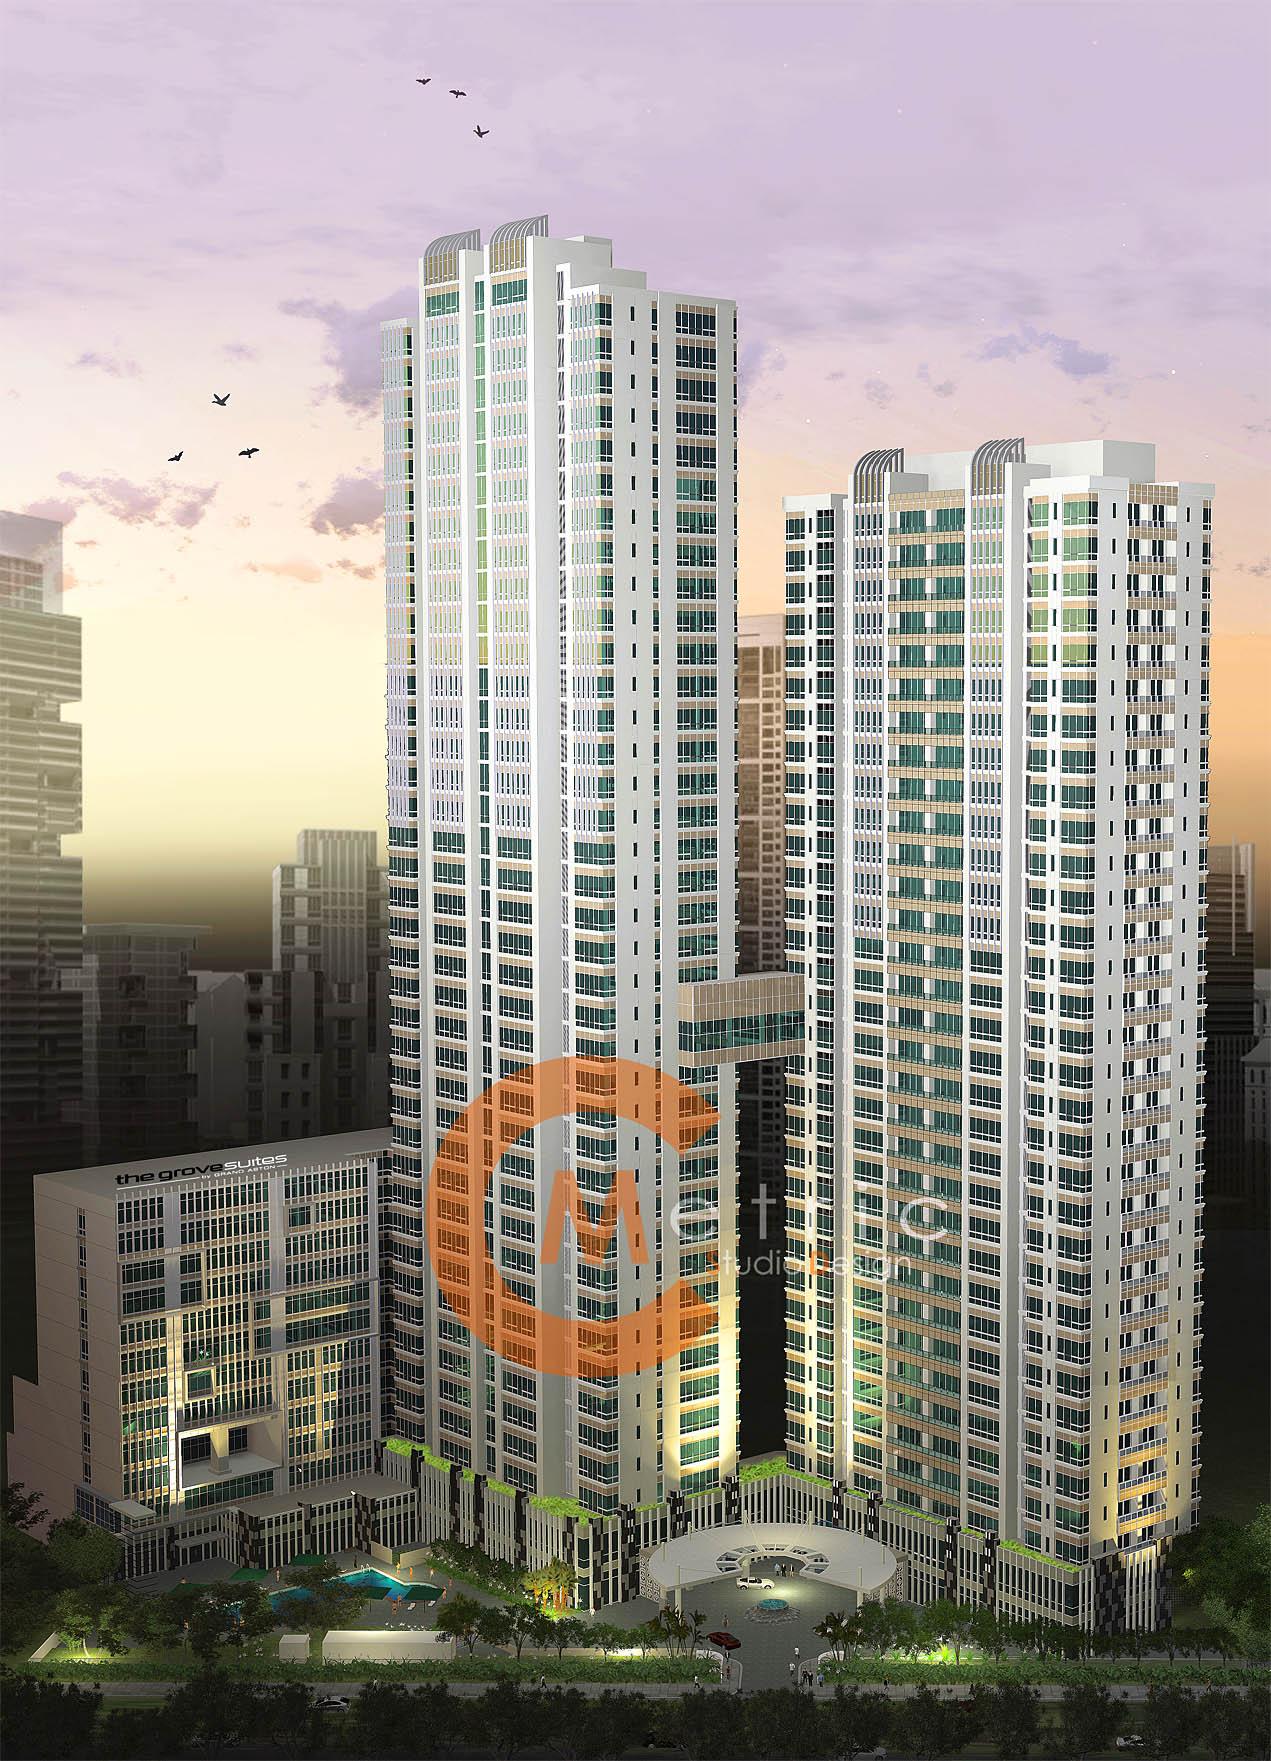 jasa pembuatan animasi arsitektur 3d jakarta